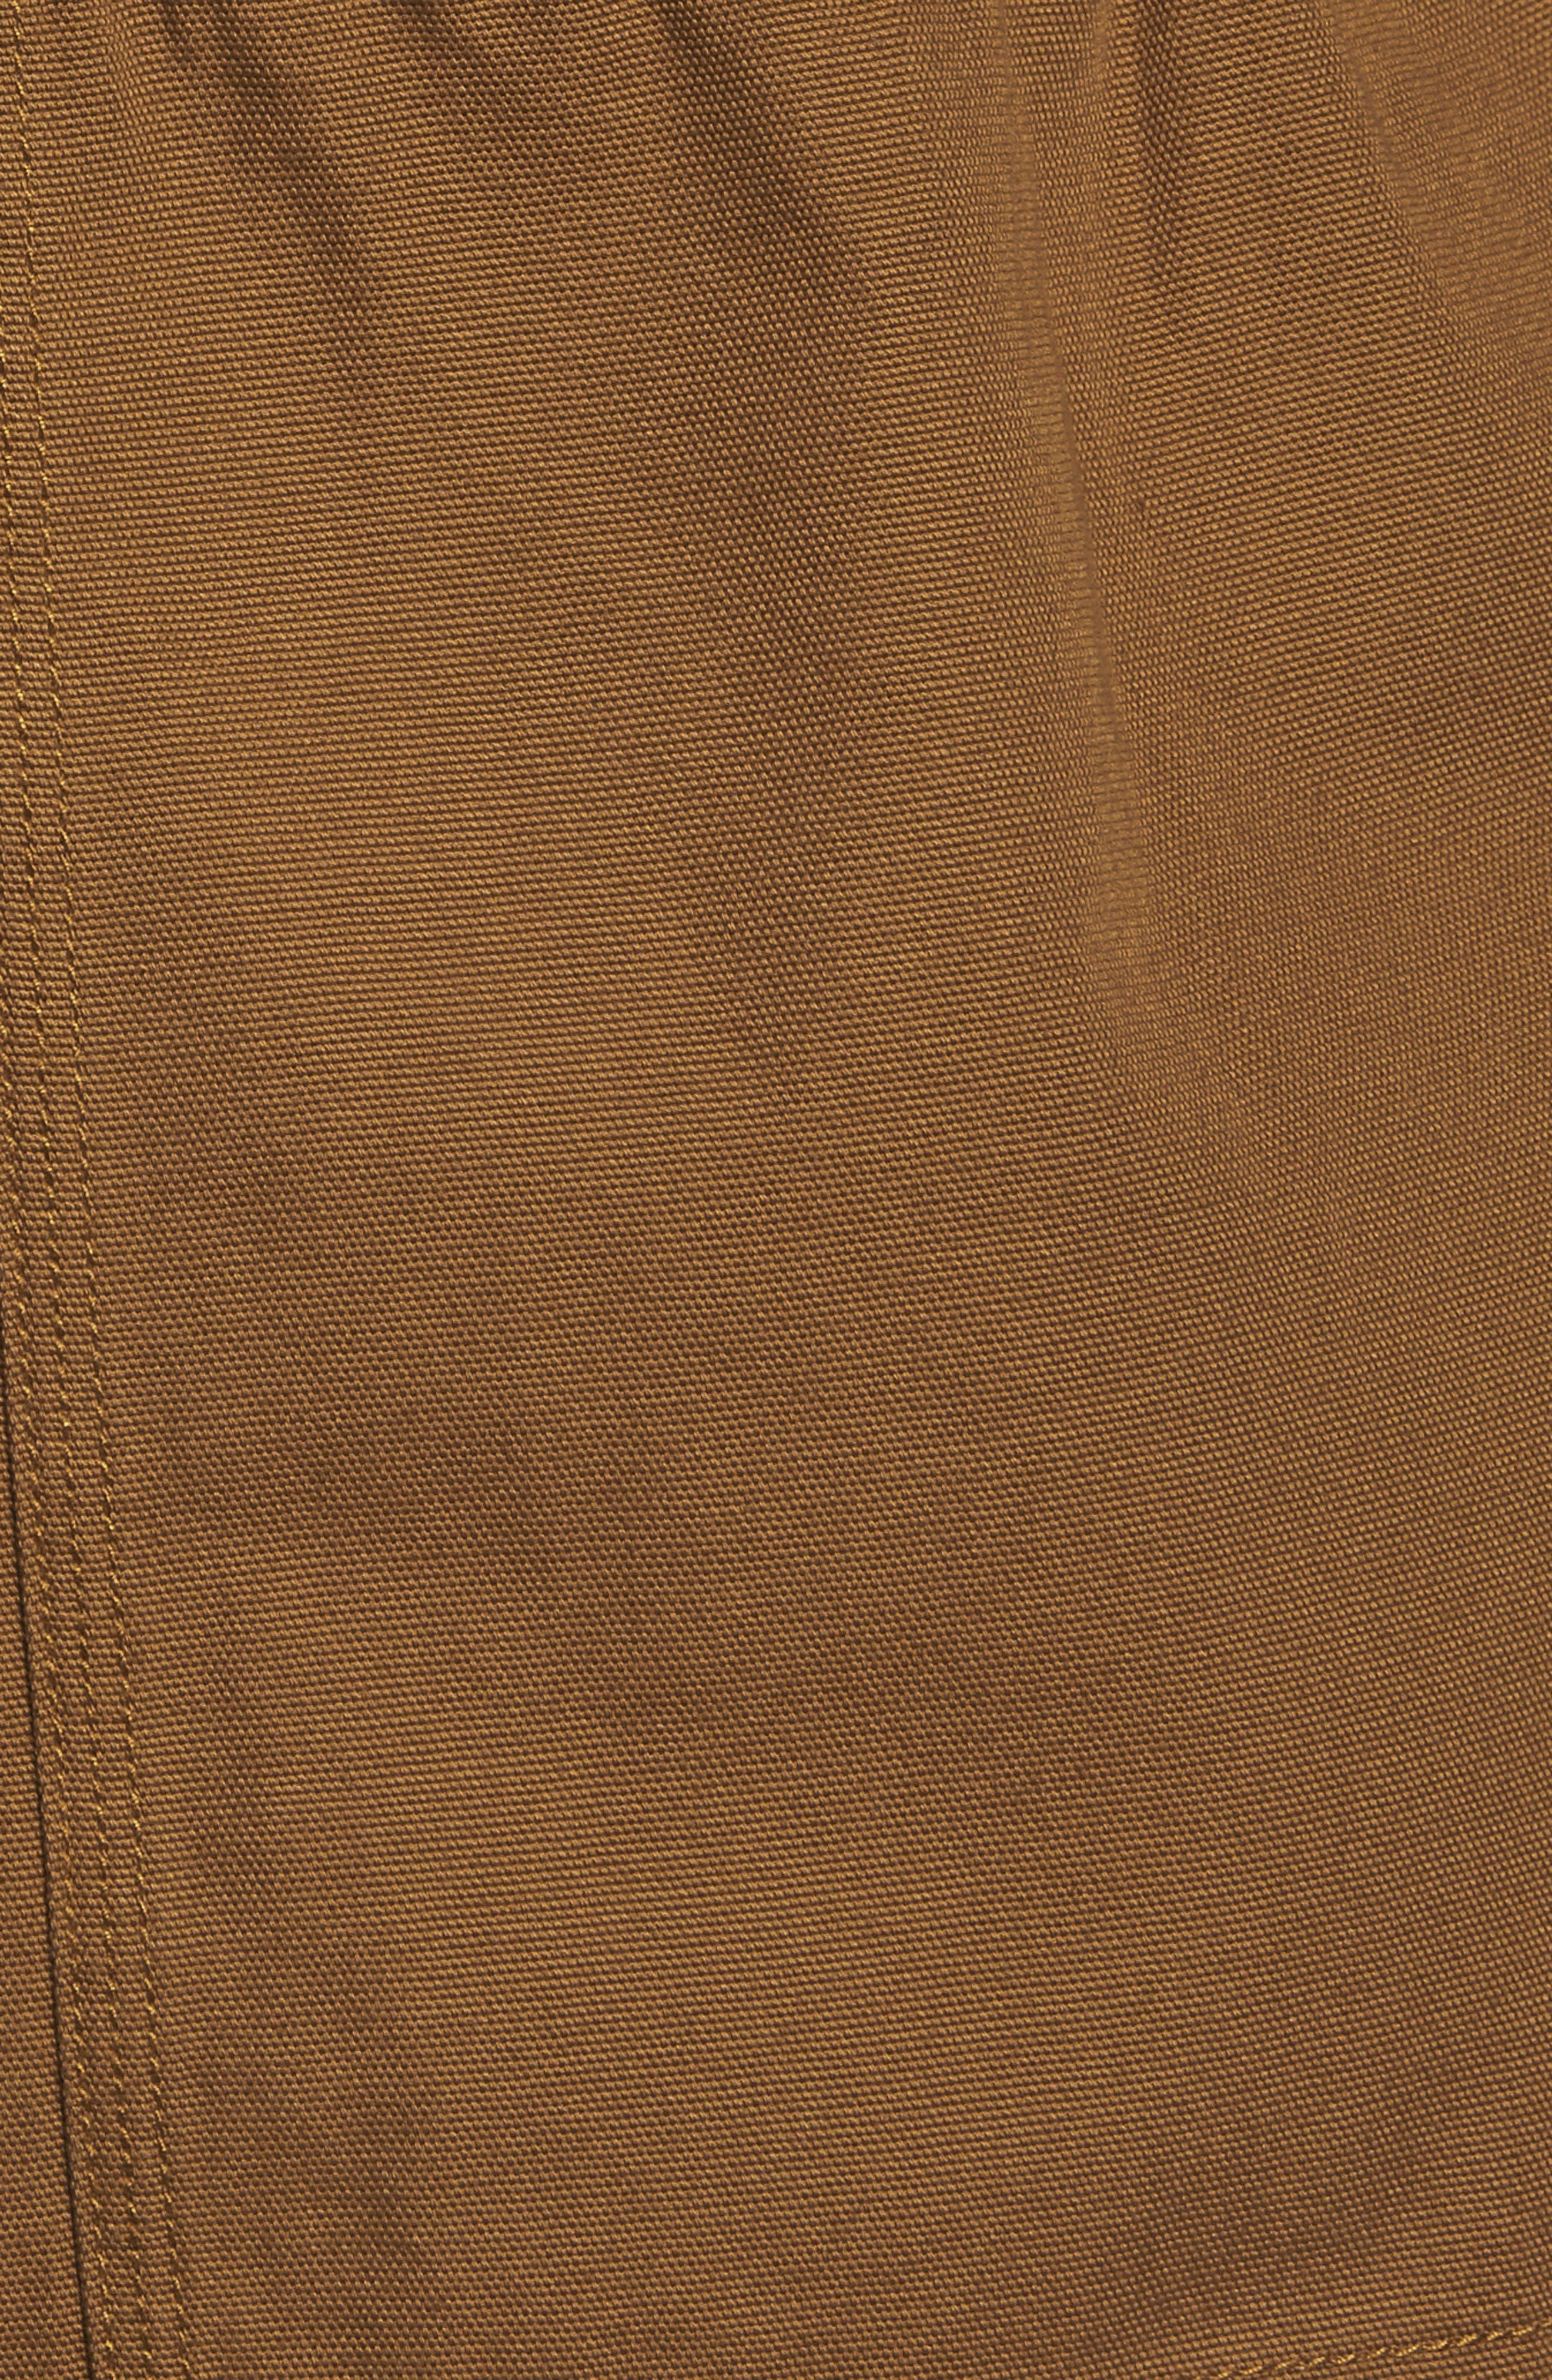 PATAGONIA,                             Prairie Dawn Jacket,                             Alternate thumbnail 7, color,                             200